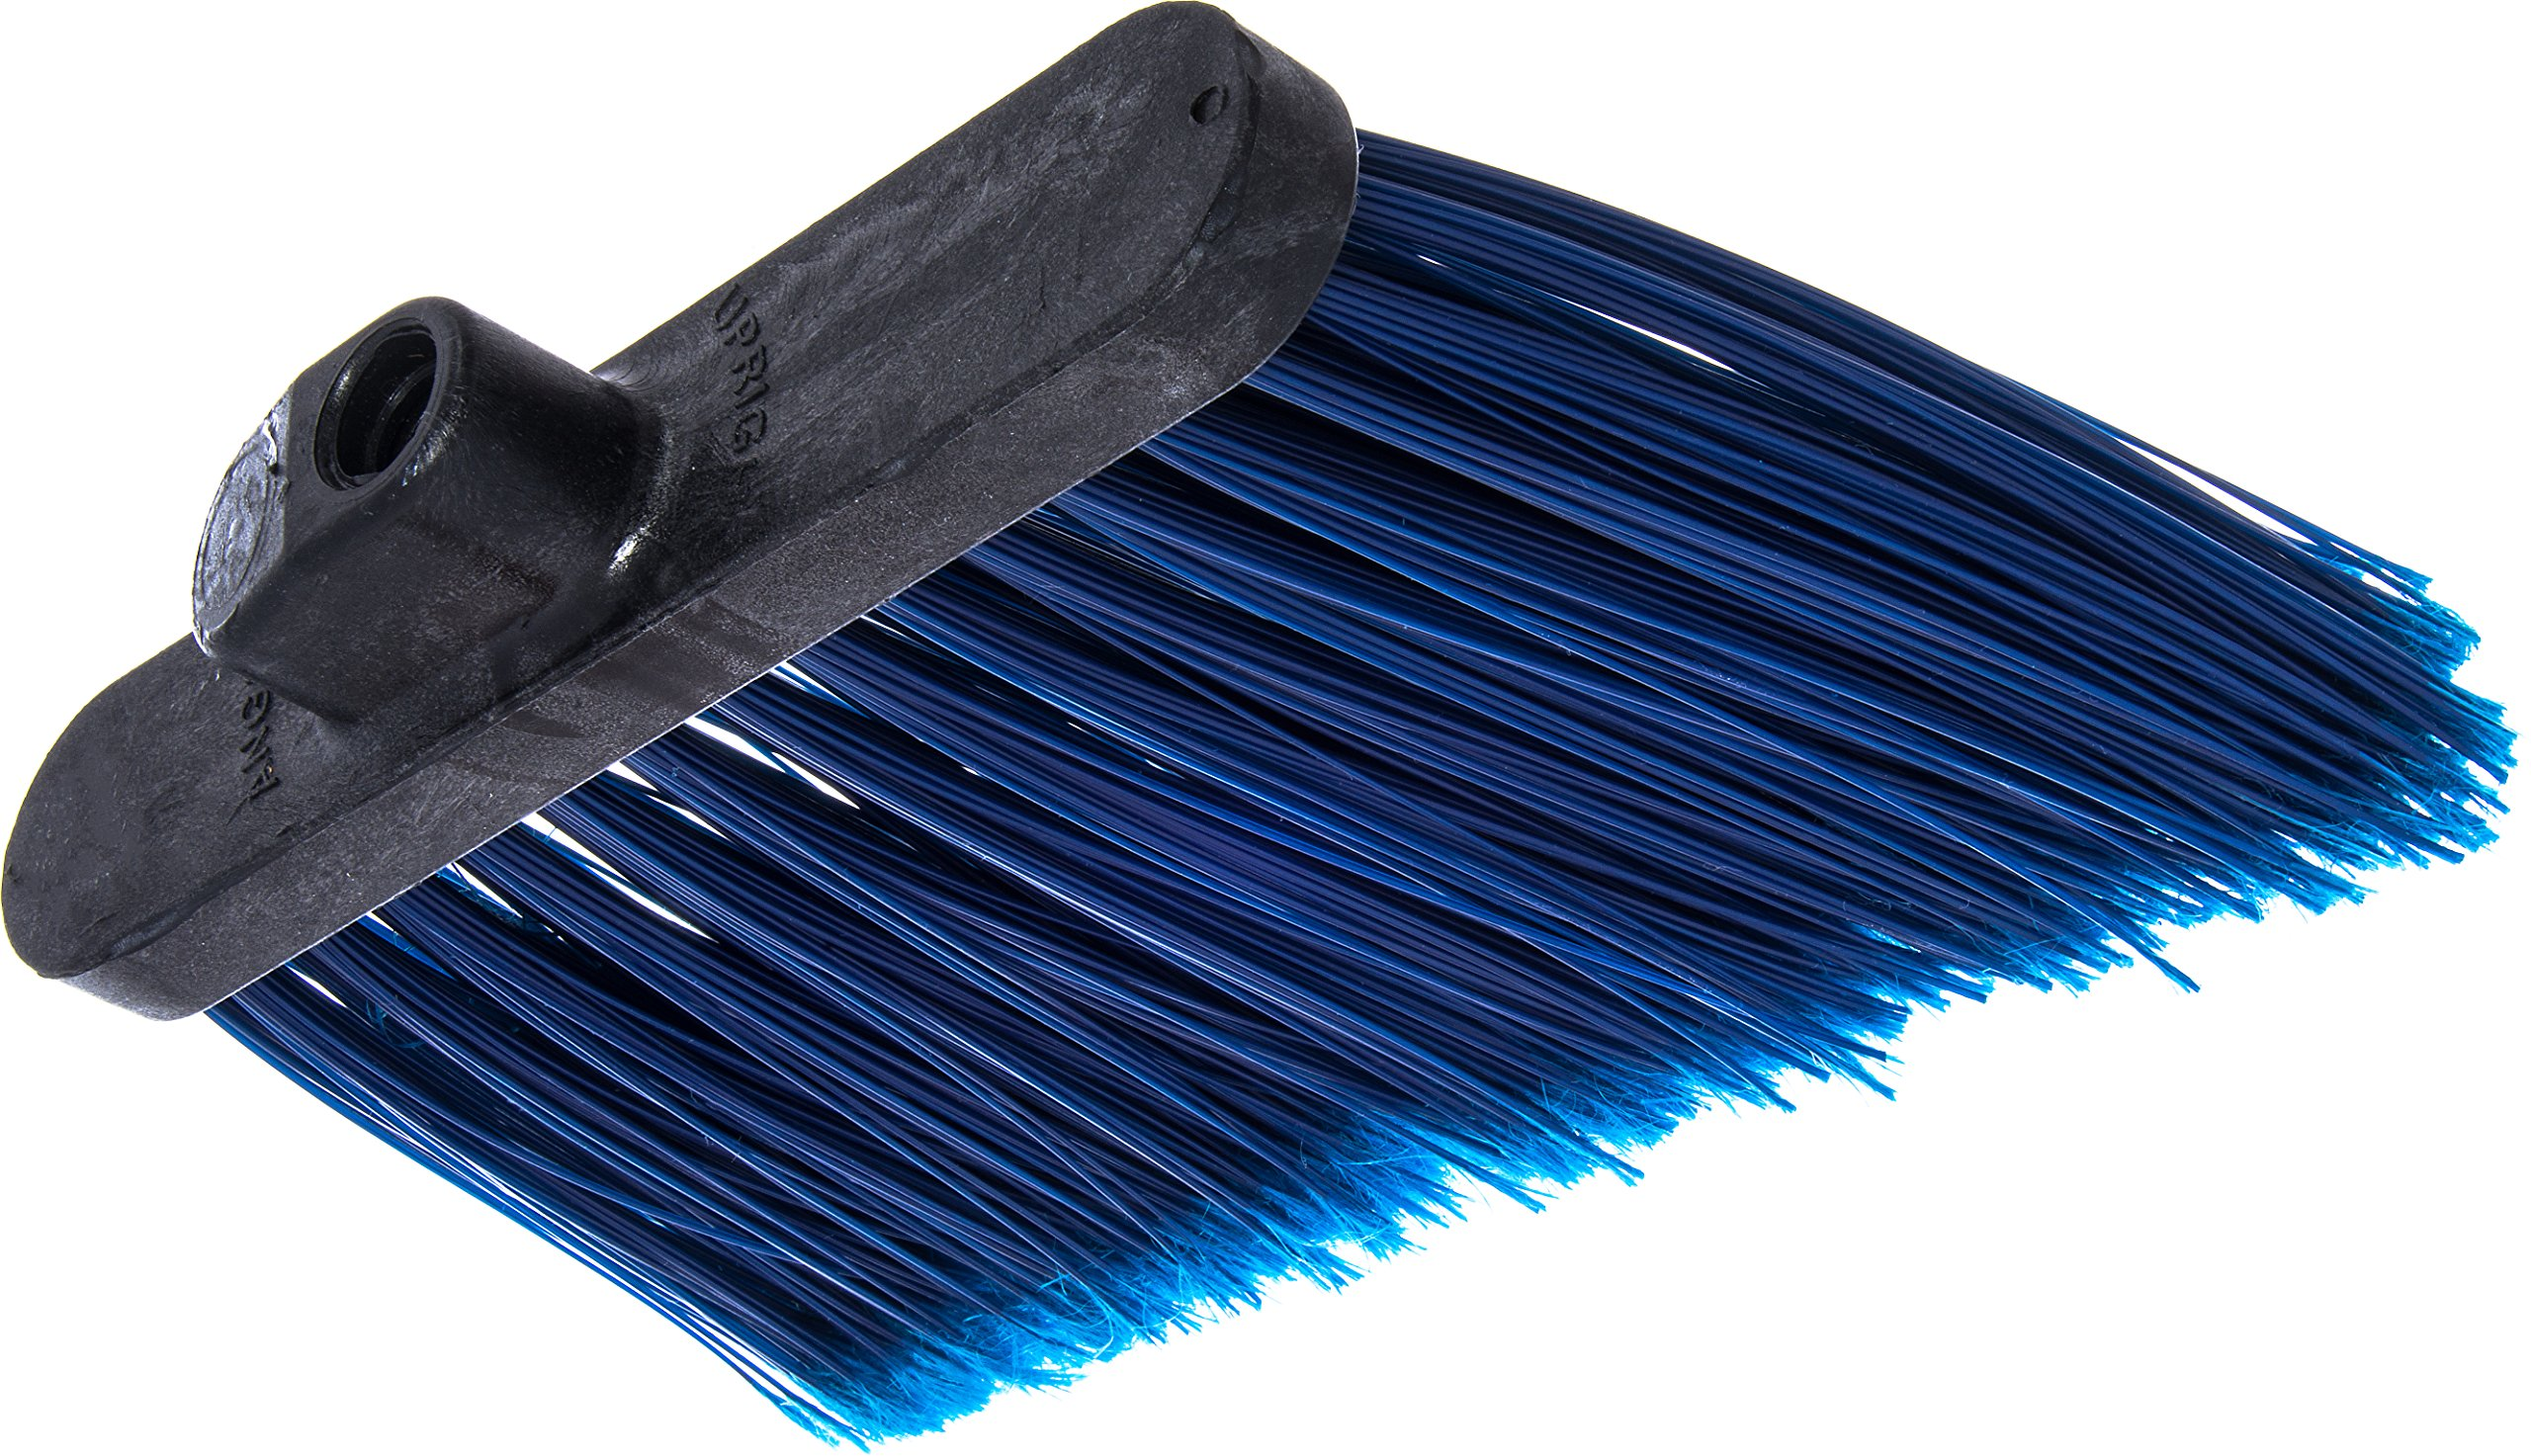 Carlisle 3686714 Duo-Sweep Medium Duty Flagged Angle Broom Head, Polypropylene Bristle, 8'' Overall Length x 12'' Width, Blue (Pack of 12) by Carlisle (Image #3)